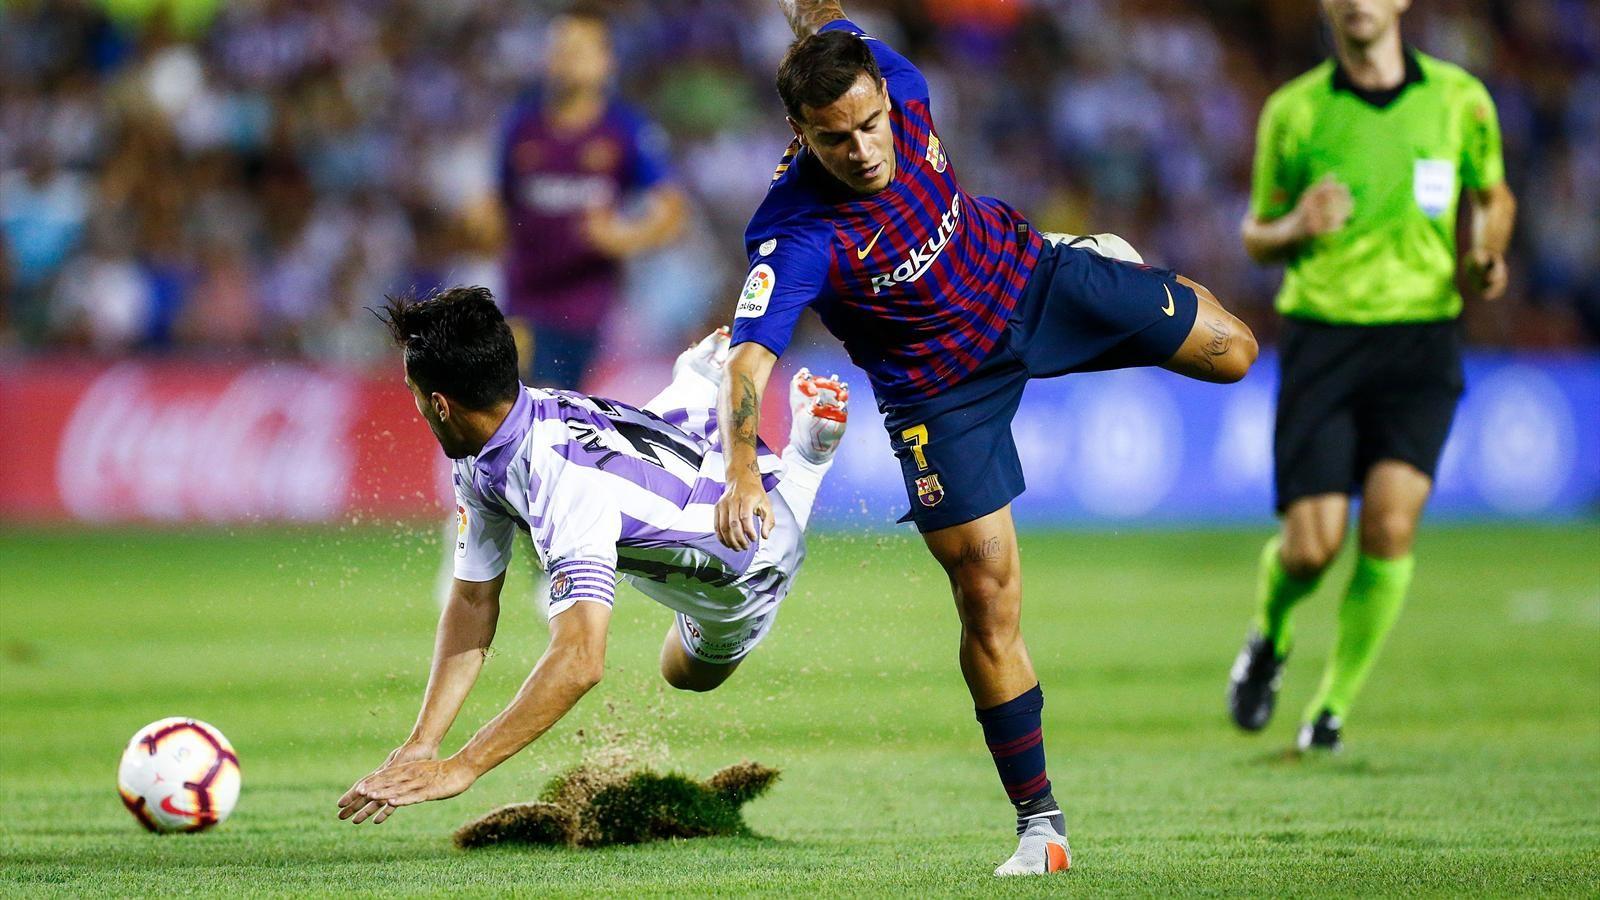 прогноз на 5 апреля 2021. «Барселона» — «Вальядолид»